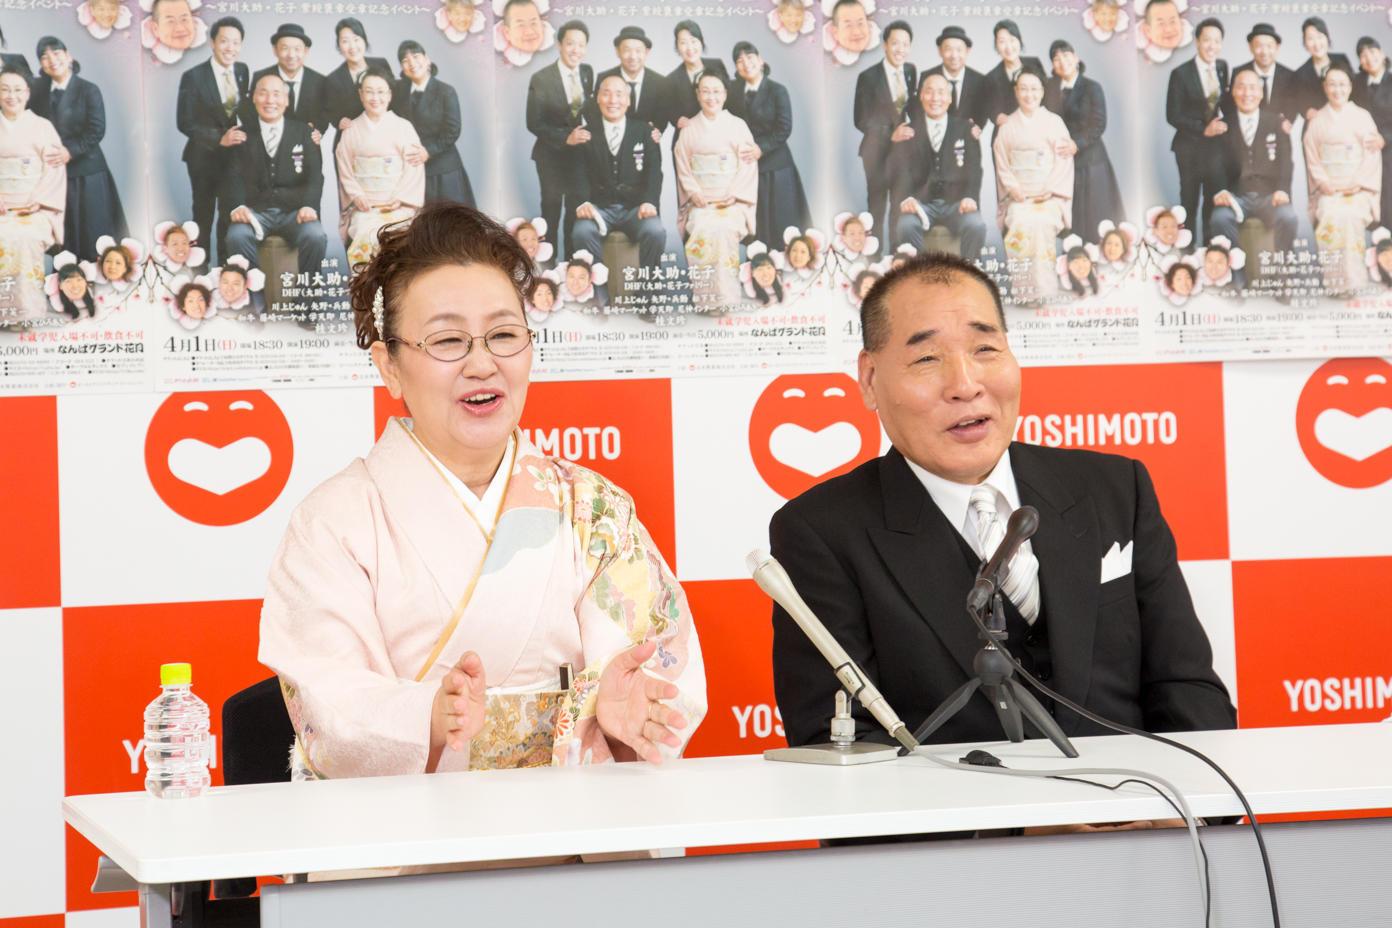 http://news.yoshimoto.co.jp/20180116115323-1e1cbb7fd0311ac30180063f0949e823dfe28ead.jpg